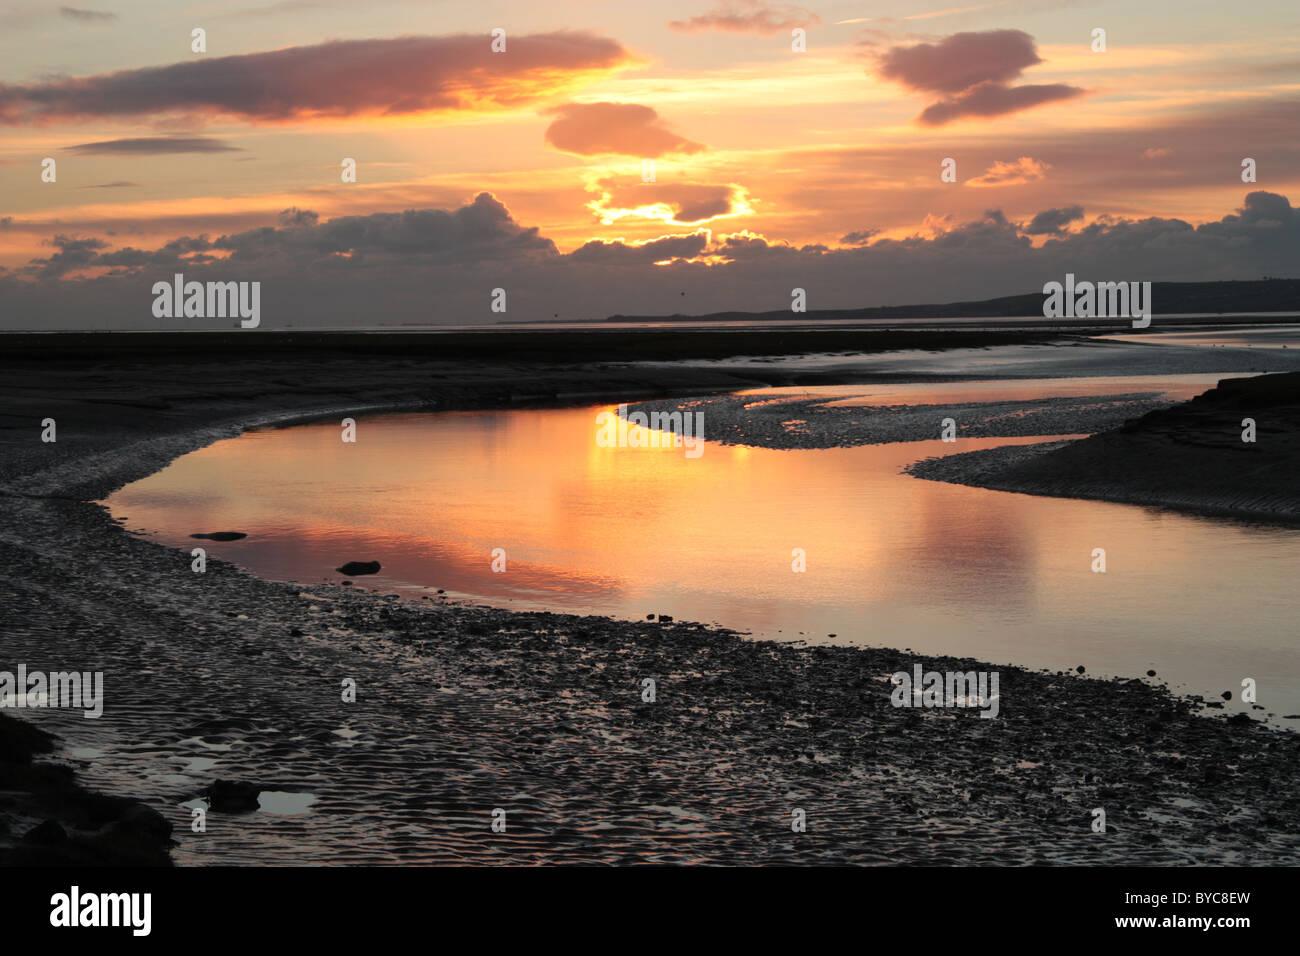 Estuary reflections 4 - Stock Image